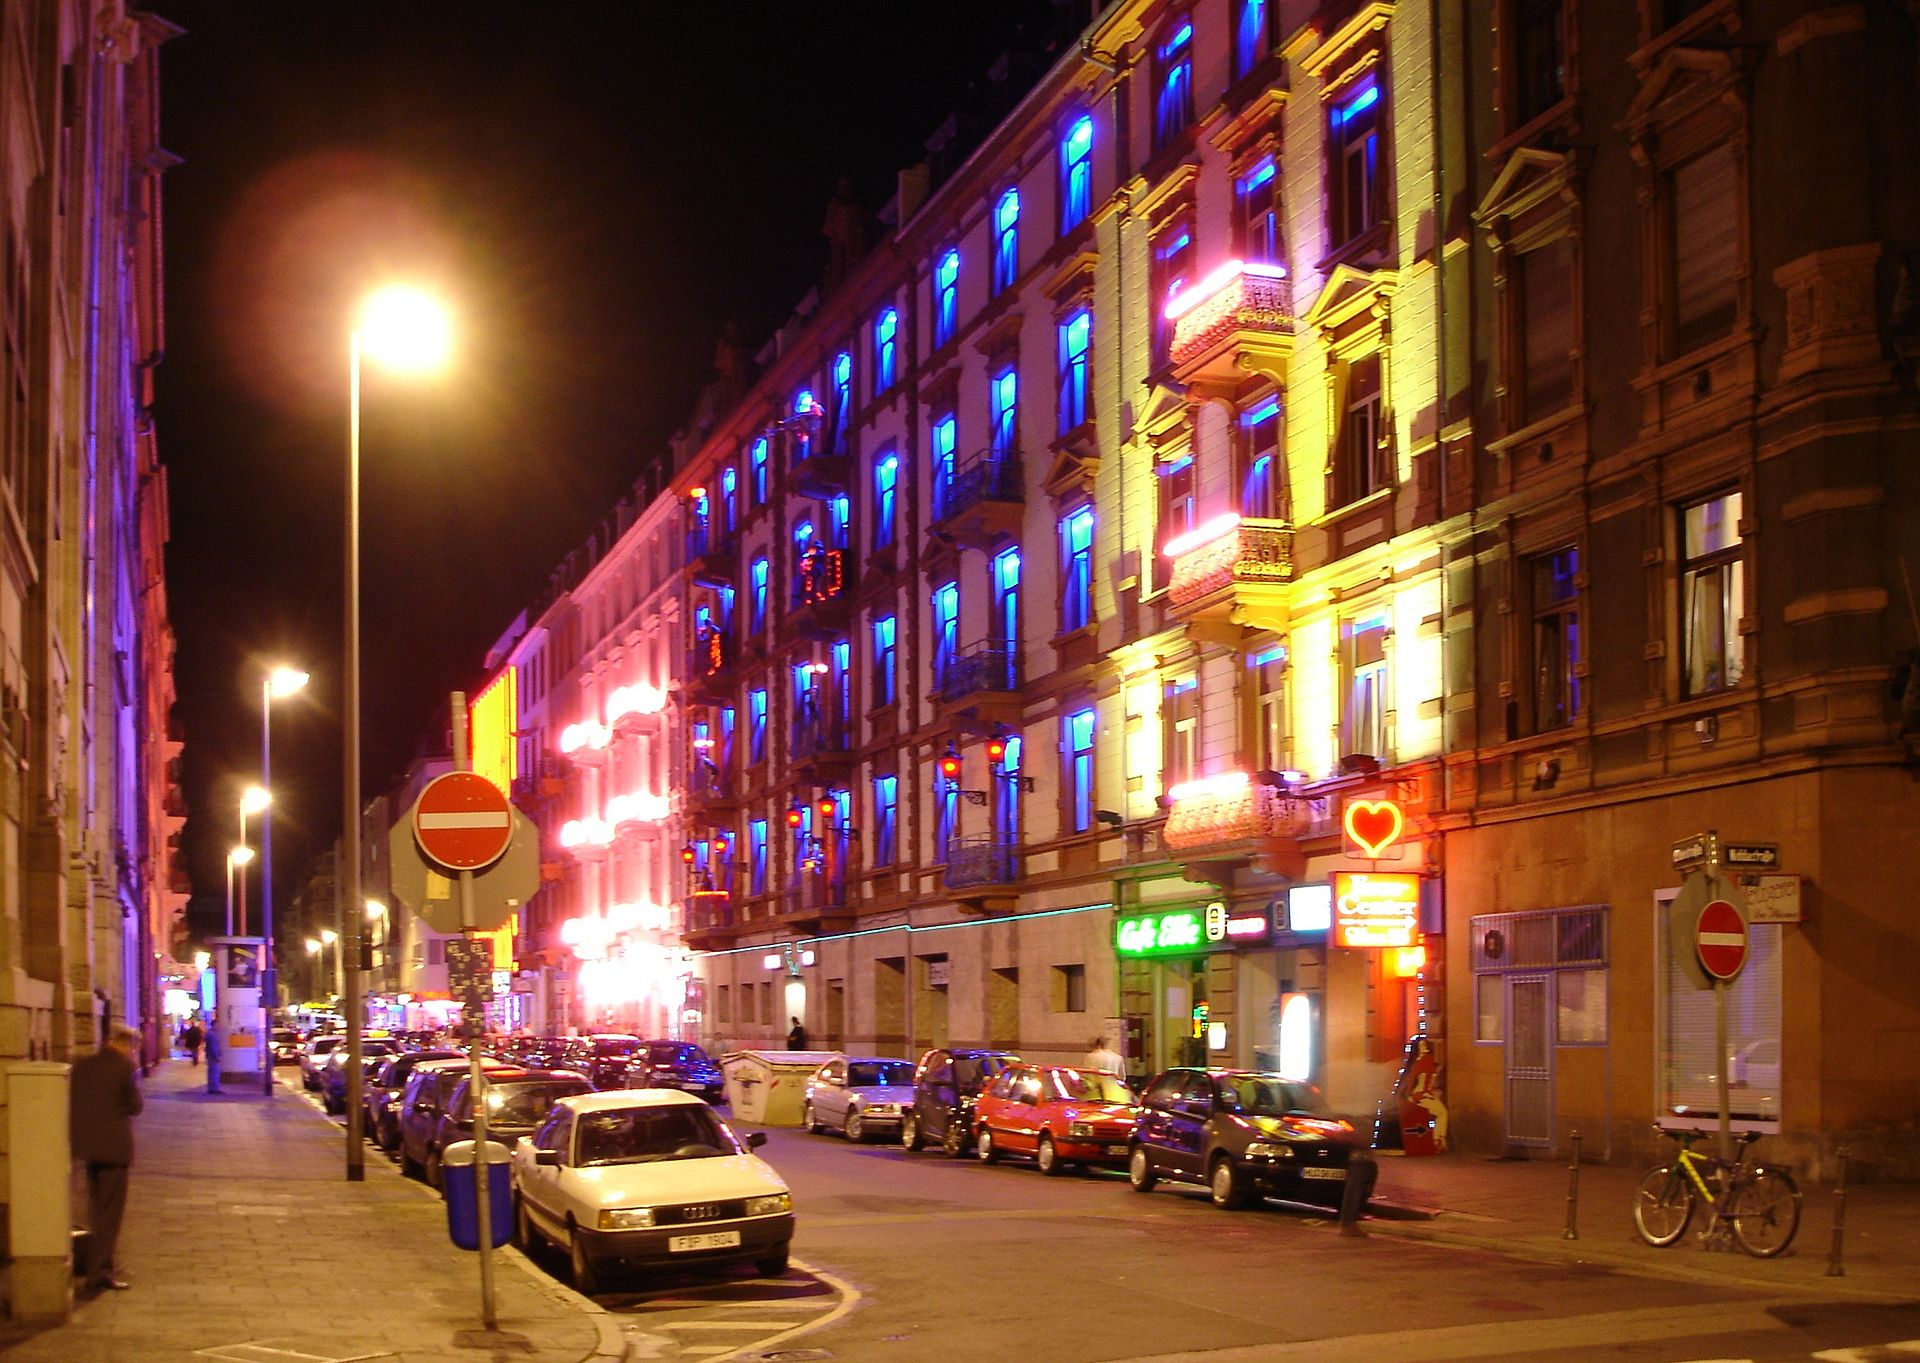 Girls in Duisburg